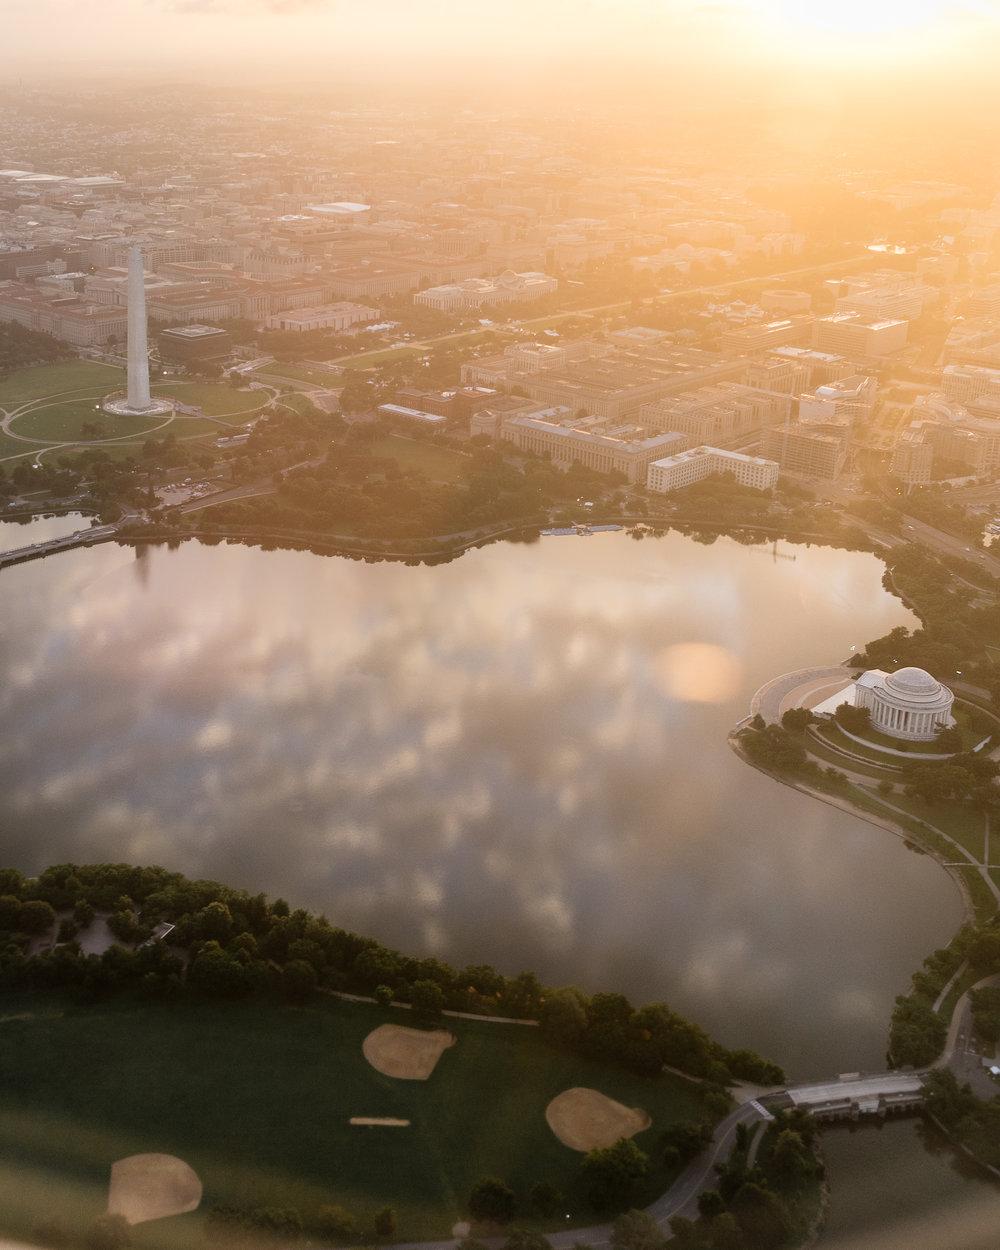 Good Morning, Washington (and Jefferson)